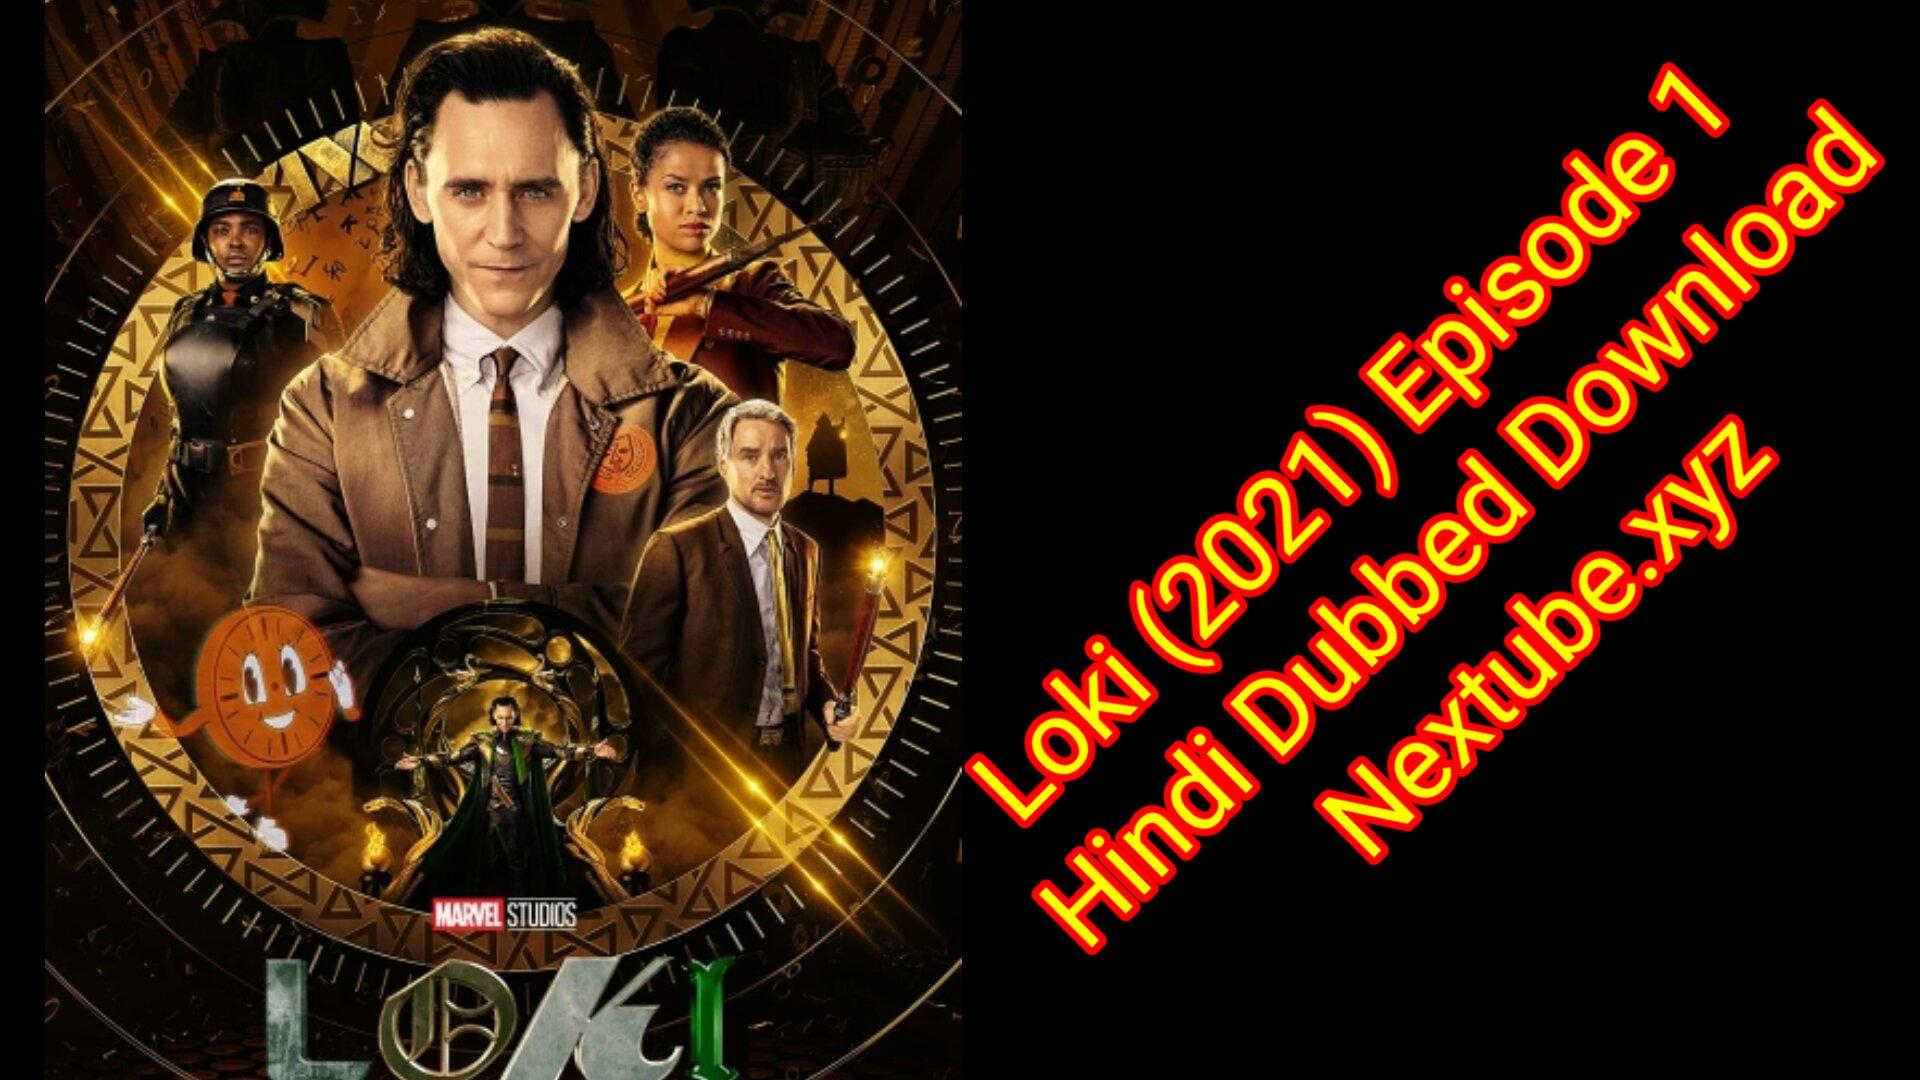 Loki (2021) Episode 1 Hindi Dubbed Download